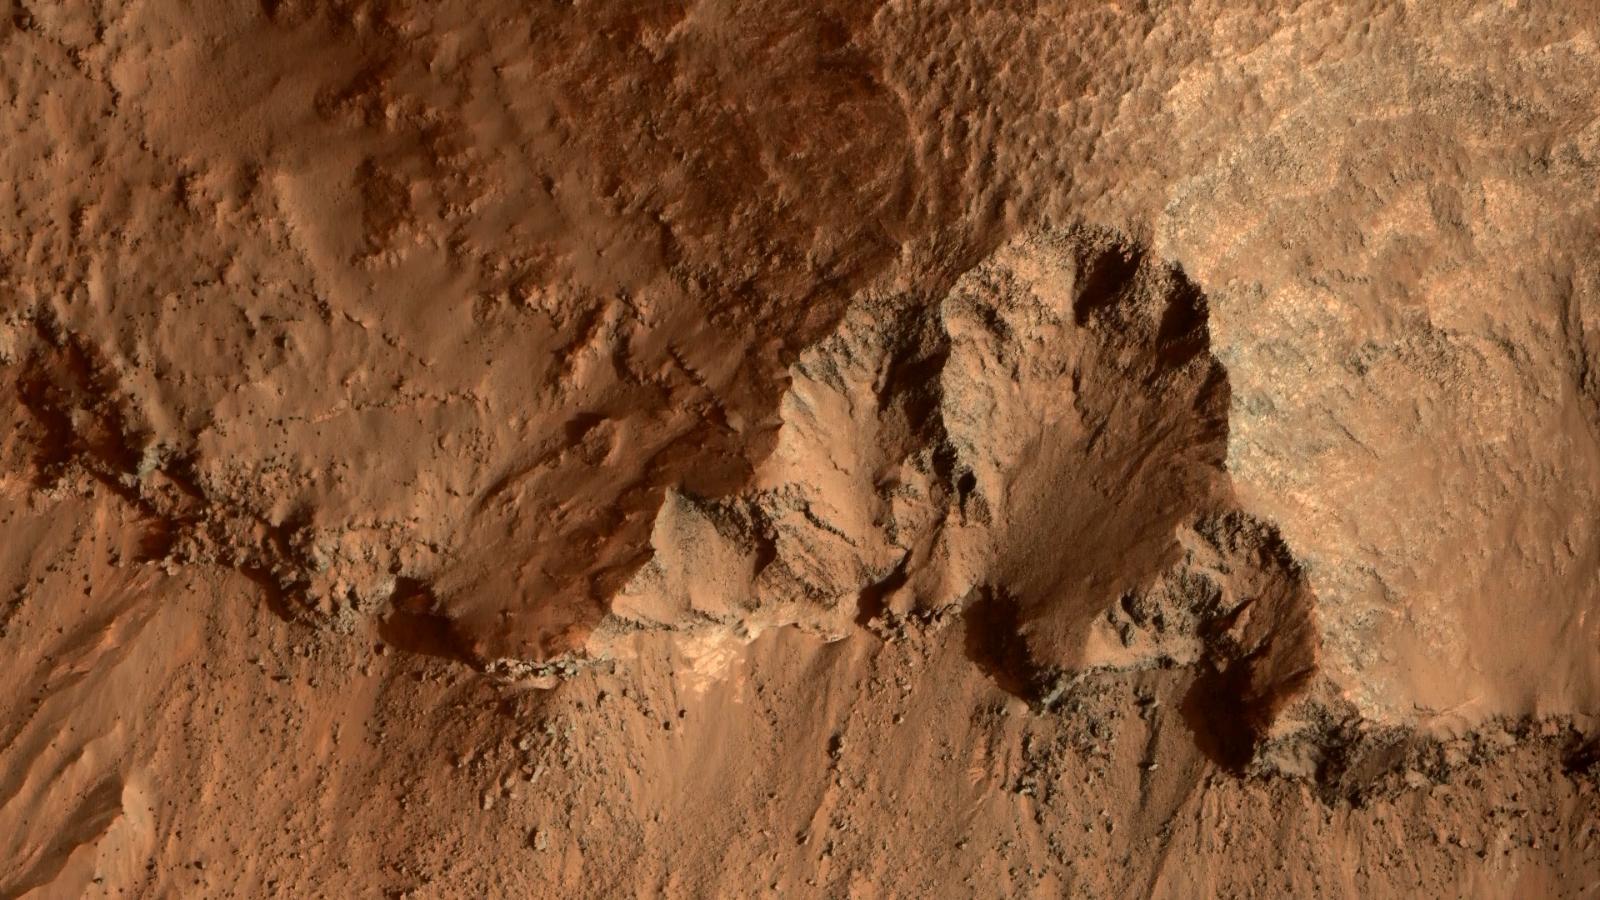 Марс фото лица принца